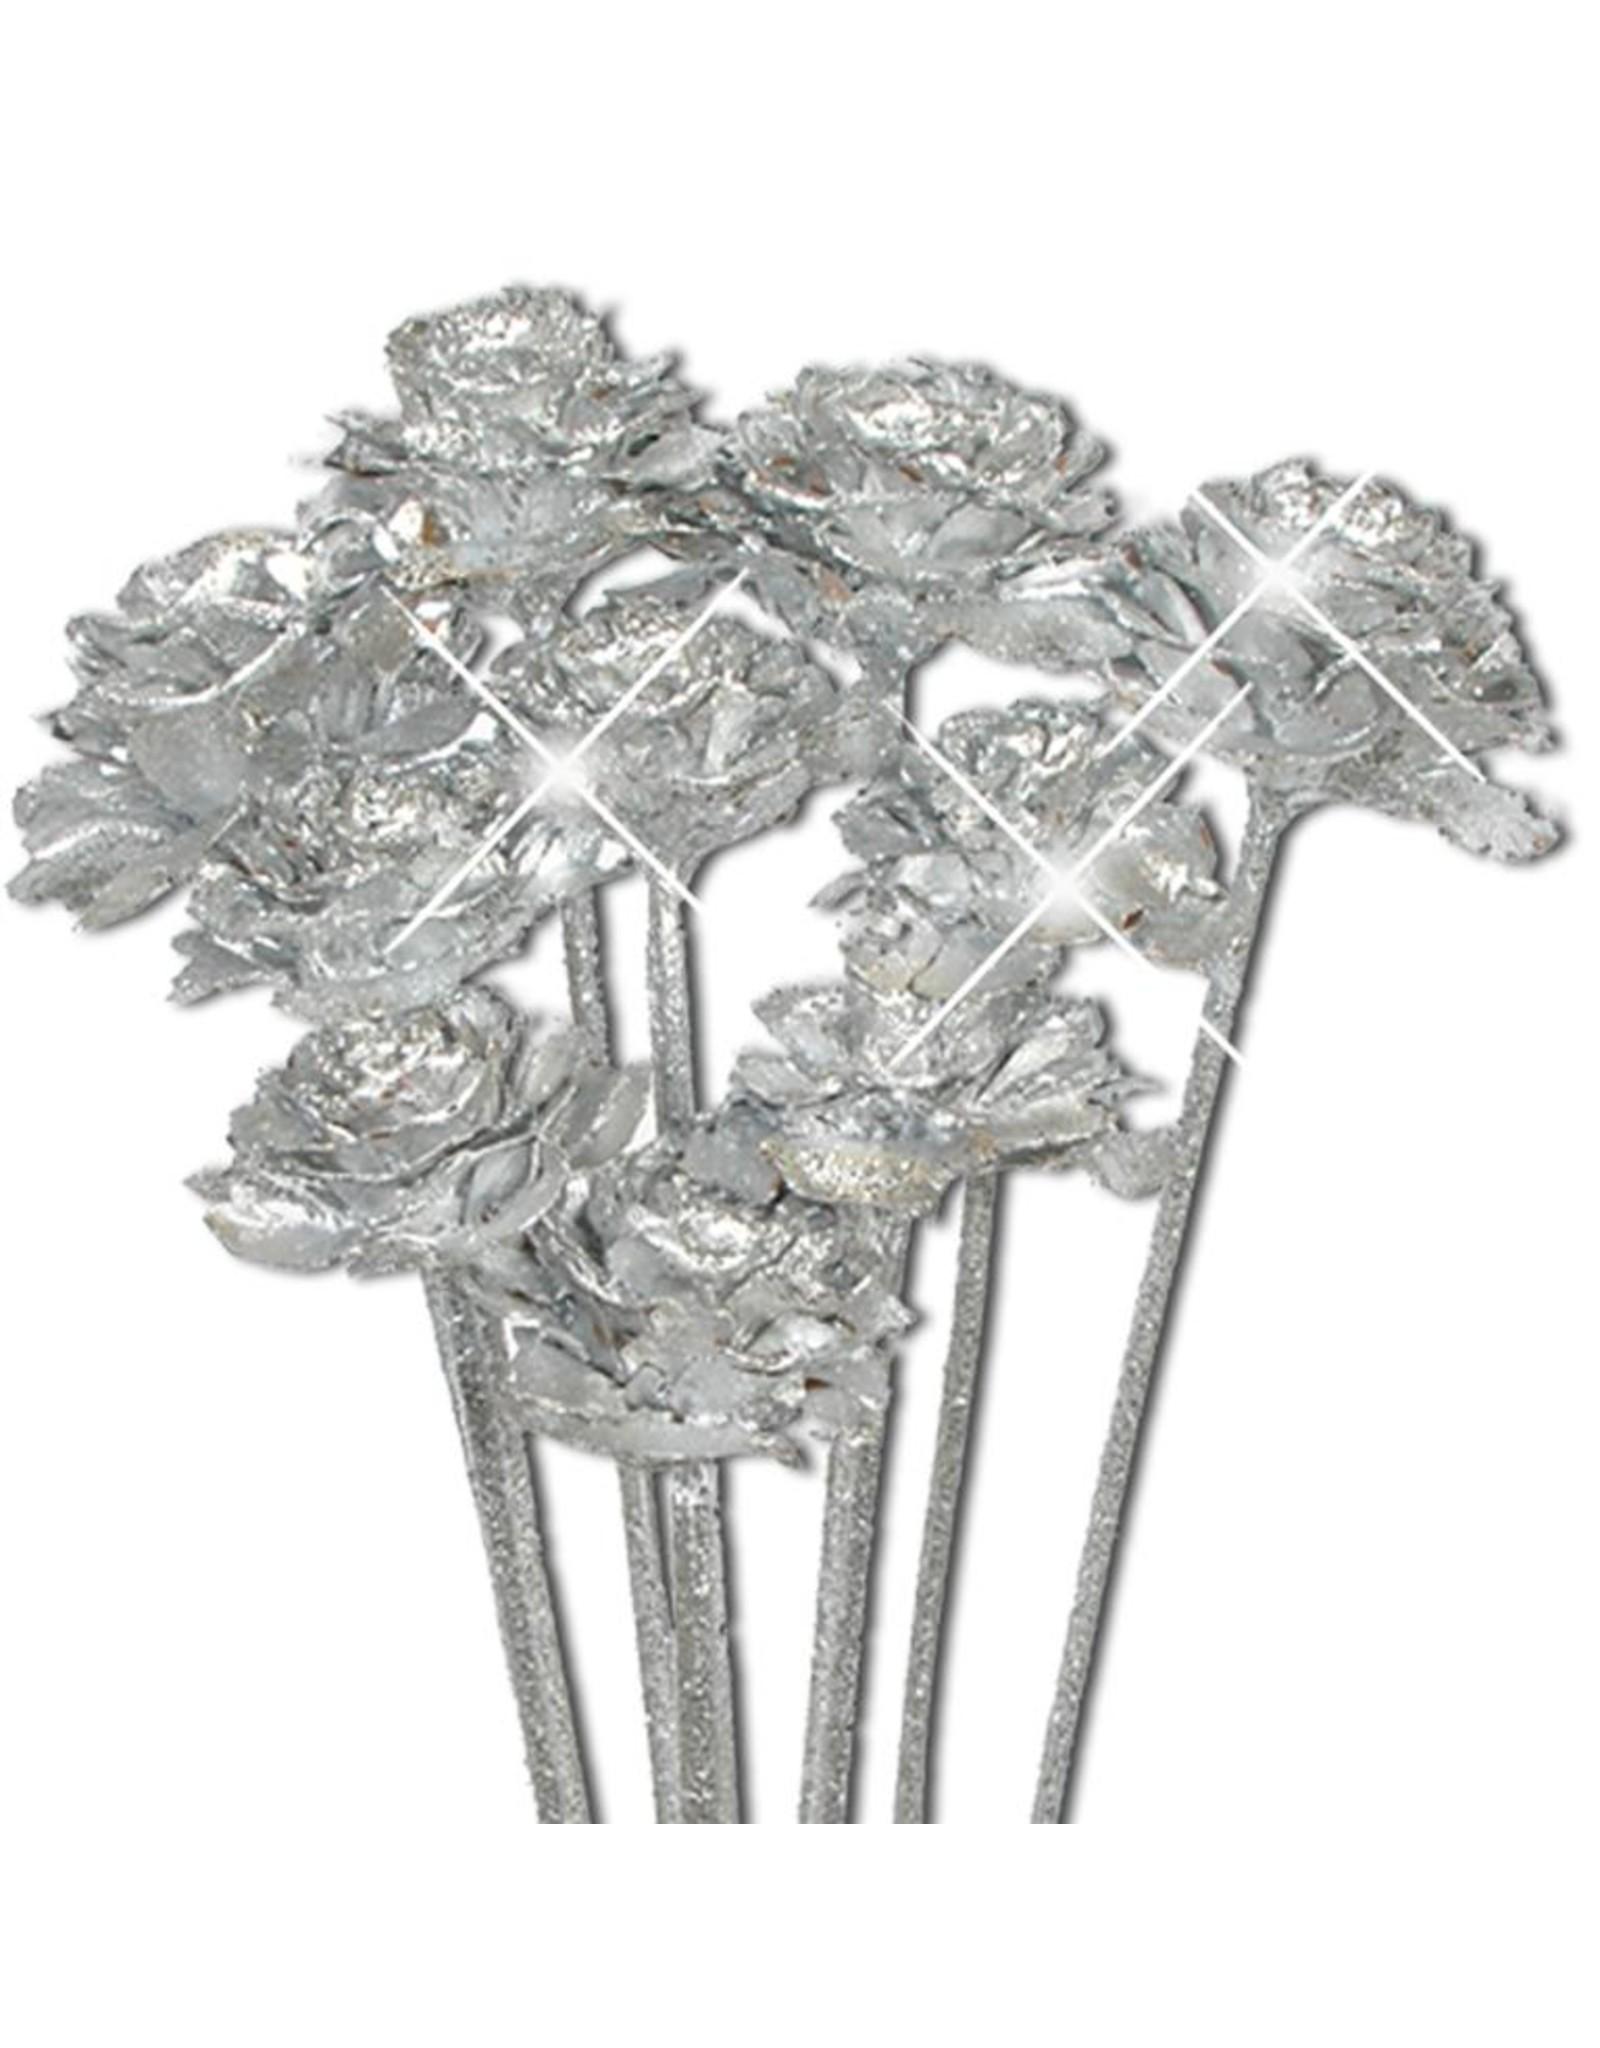 Cedar rose o/s 10pc silver silver glitter x 25